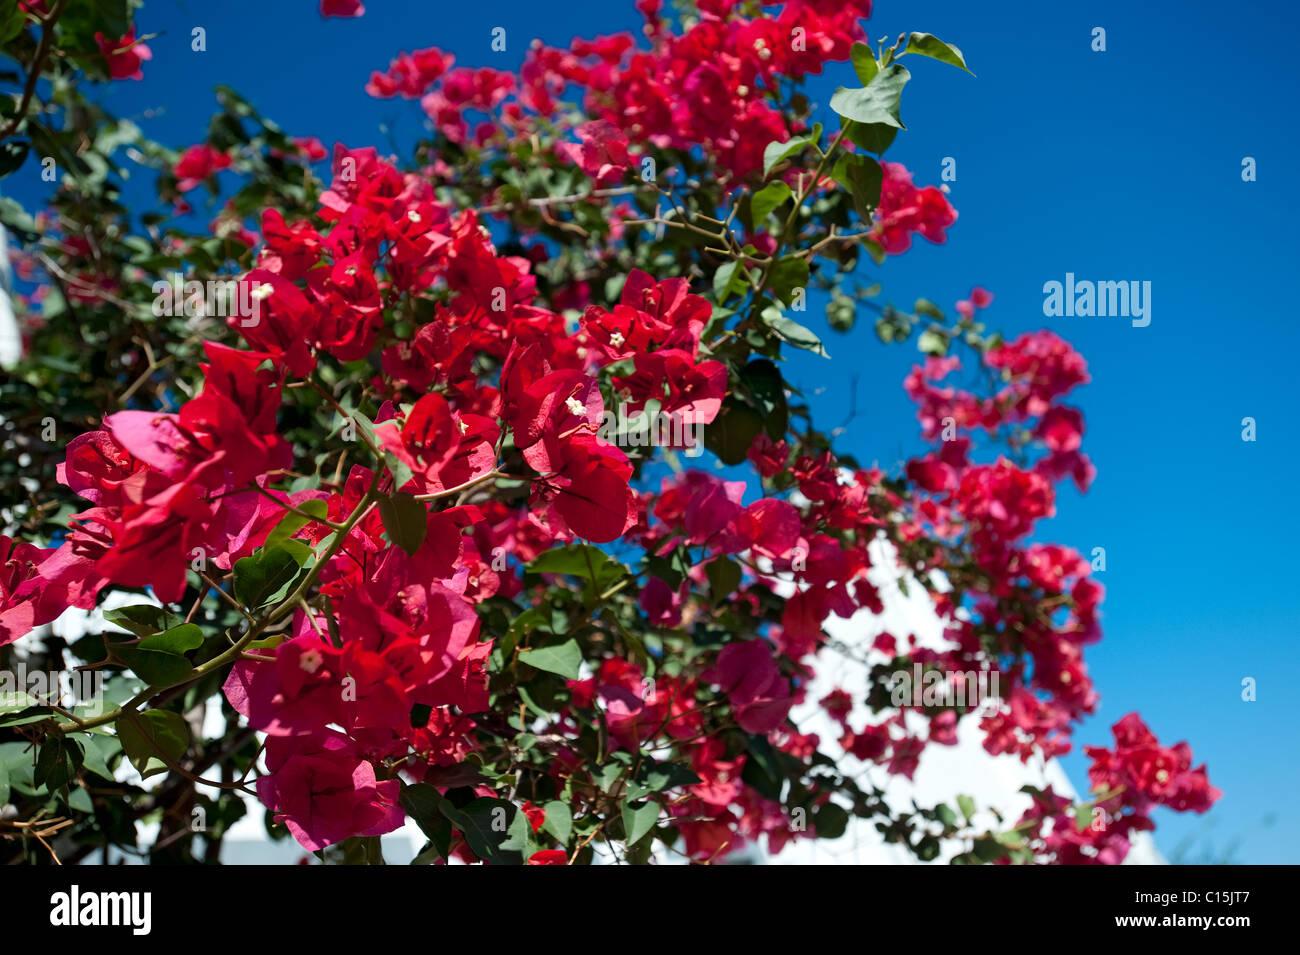 Bougainvillea on vine, Corfu, Greece - Stock Image